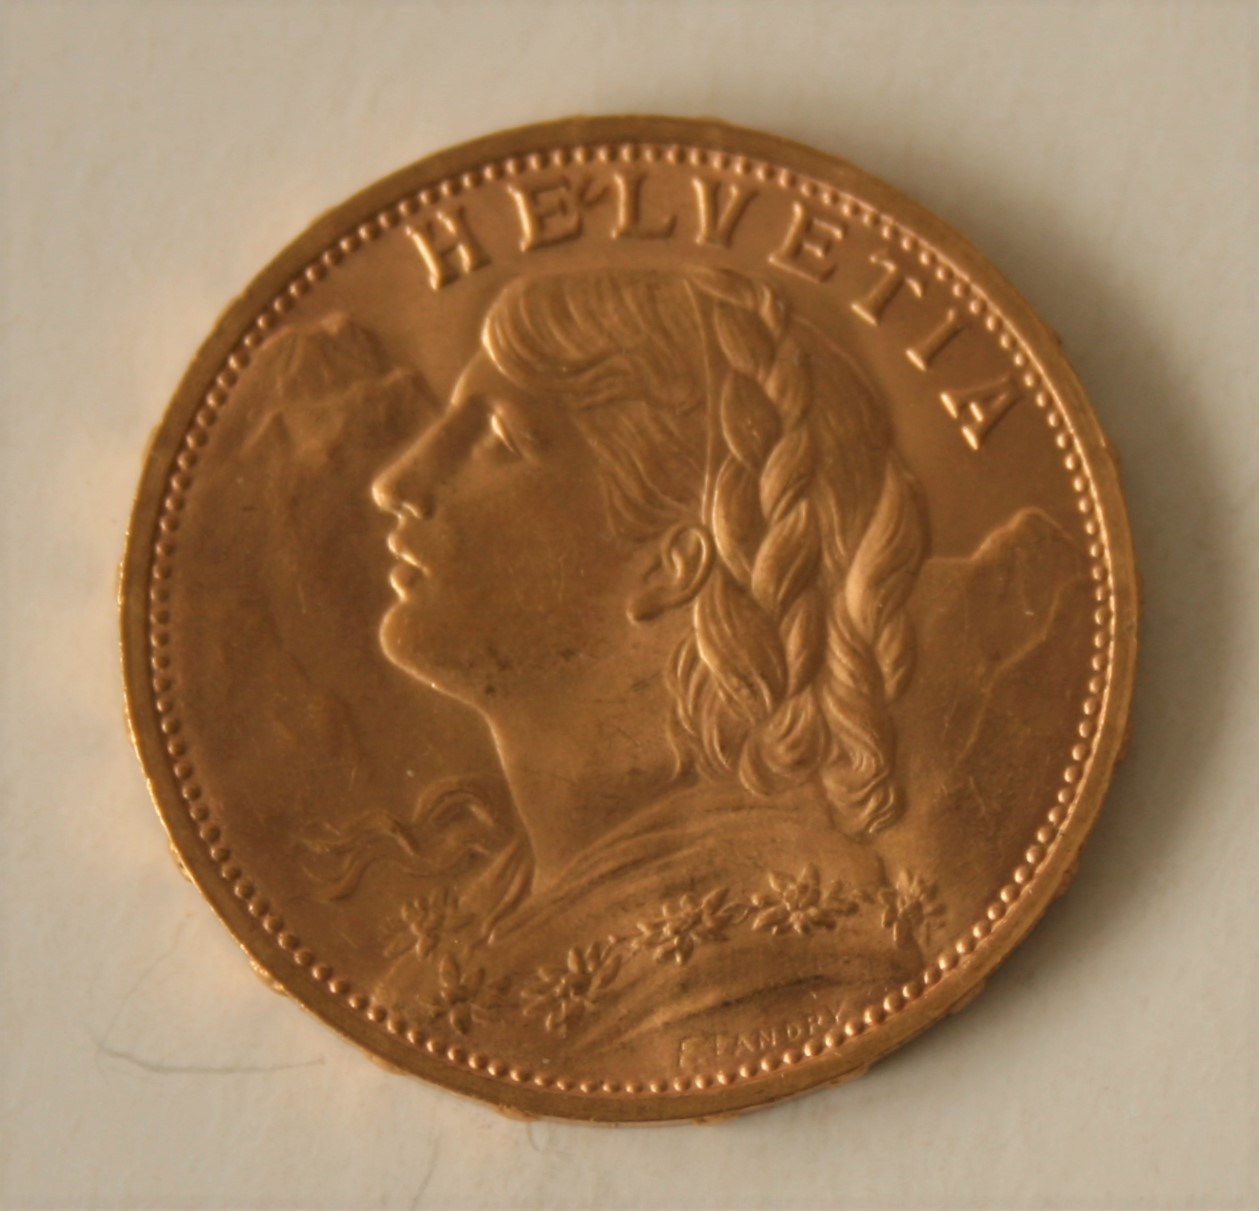 Lot 9 - Piece 20 Francs Or HELVETIA 1930 - Poids : 6,47 g - HELVETIA 1930, gold coin - [...]